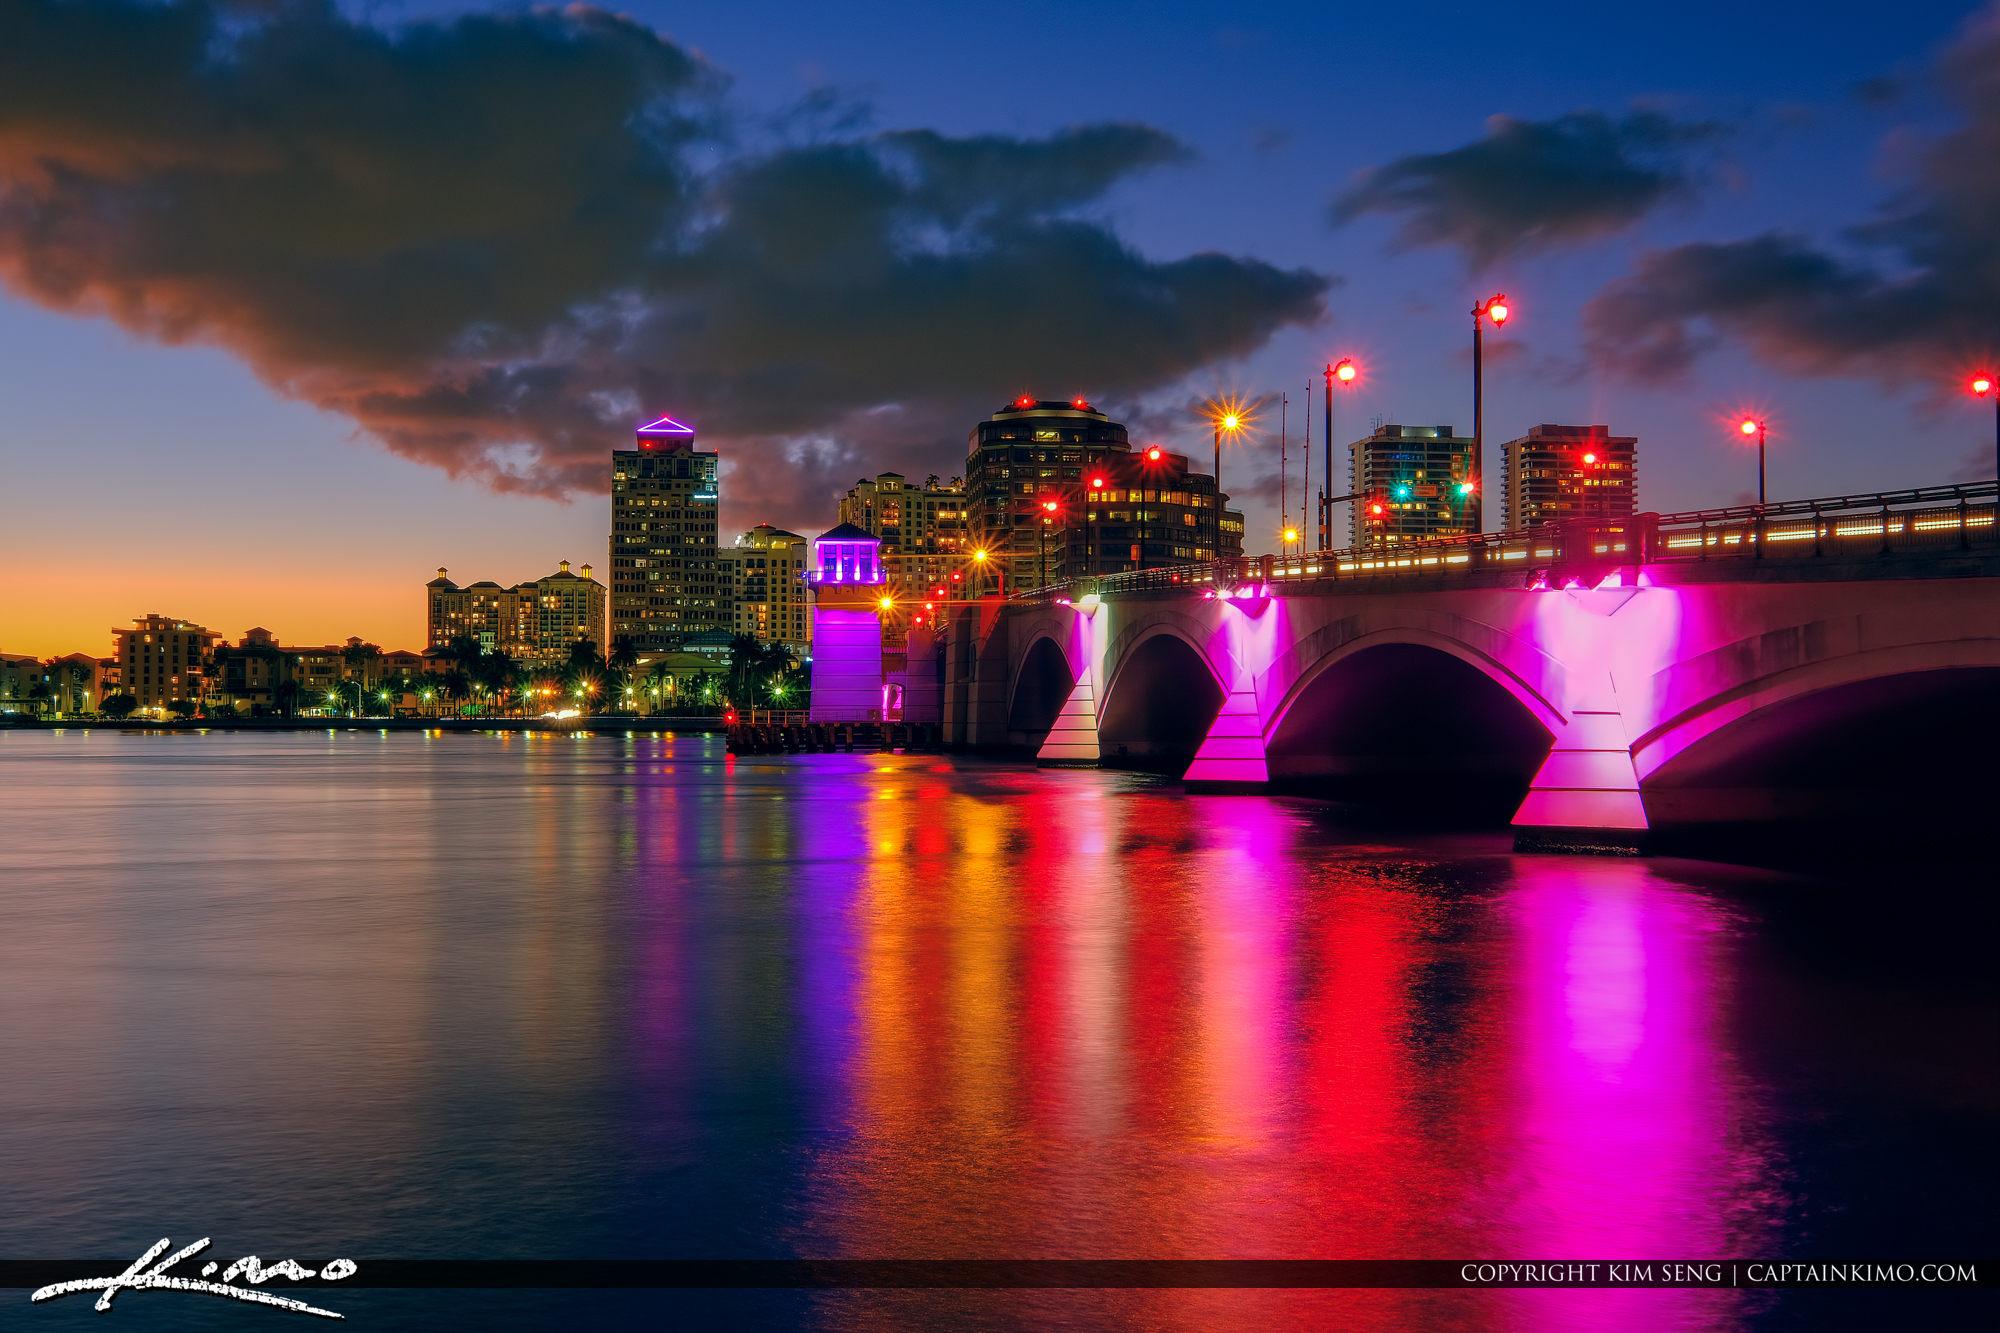 West Palm Beach Breast Cancer Awareness Royal Park Bridge Lights 2019